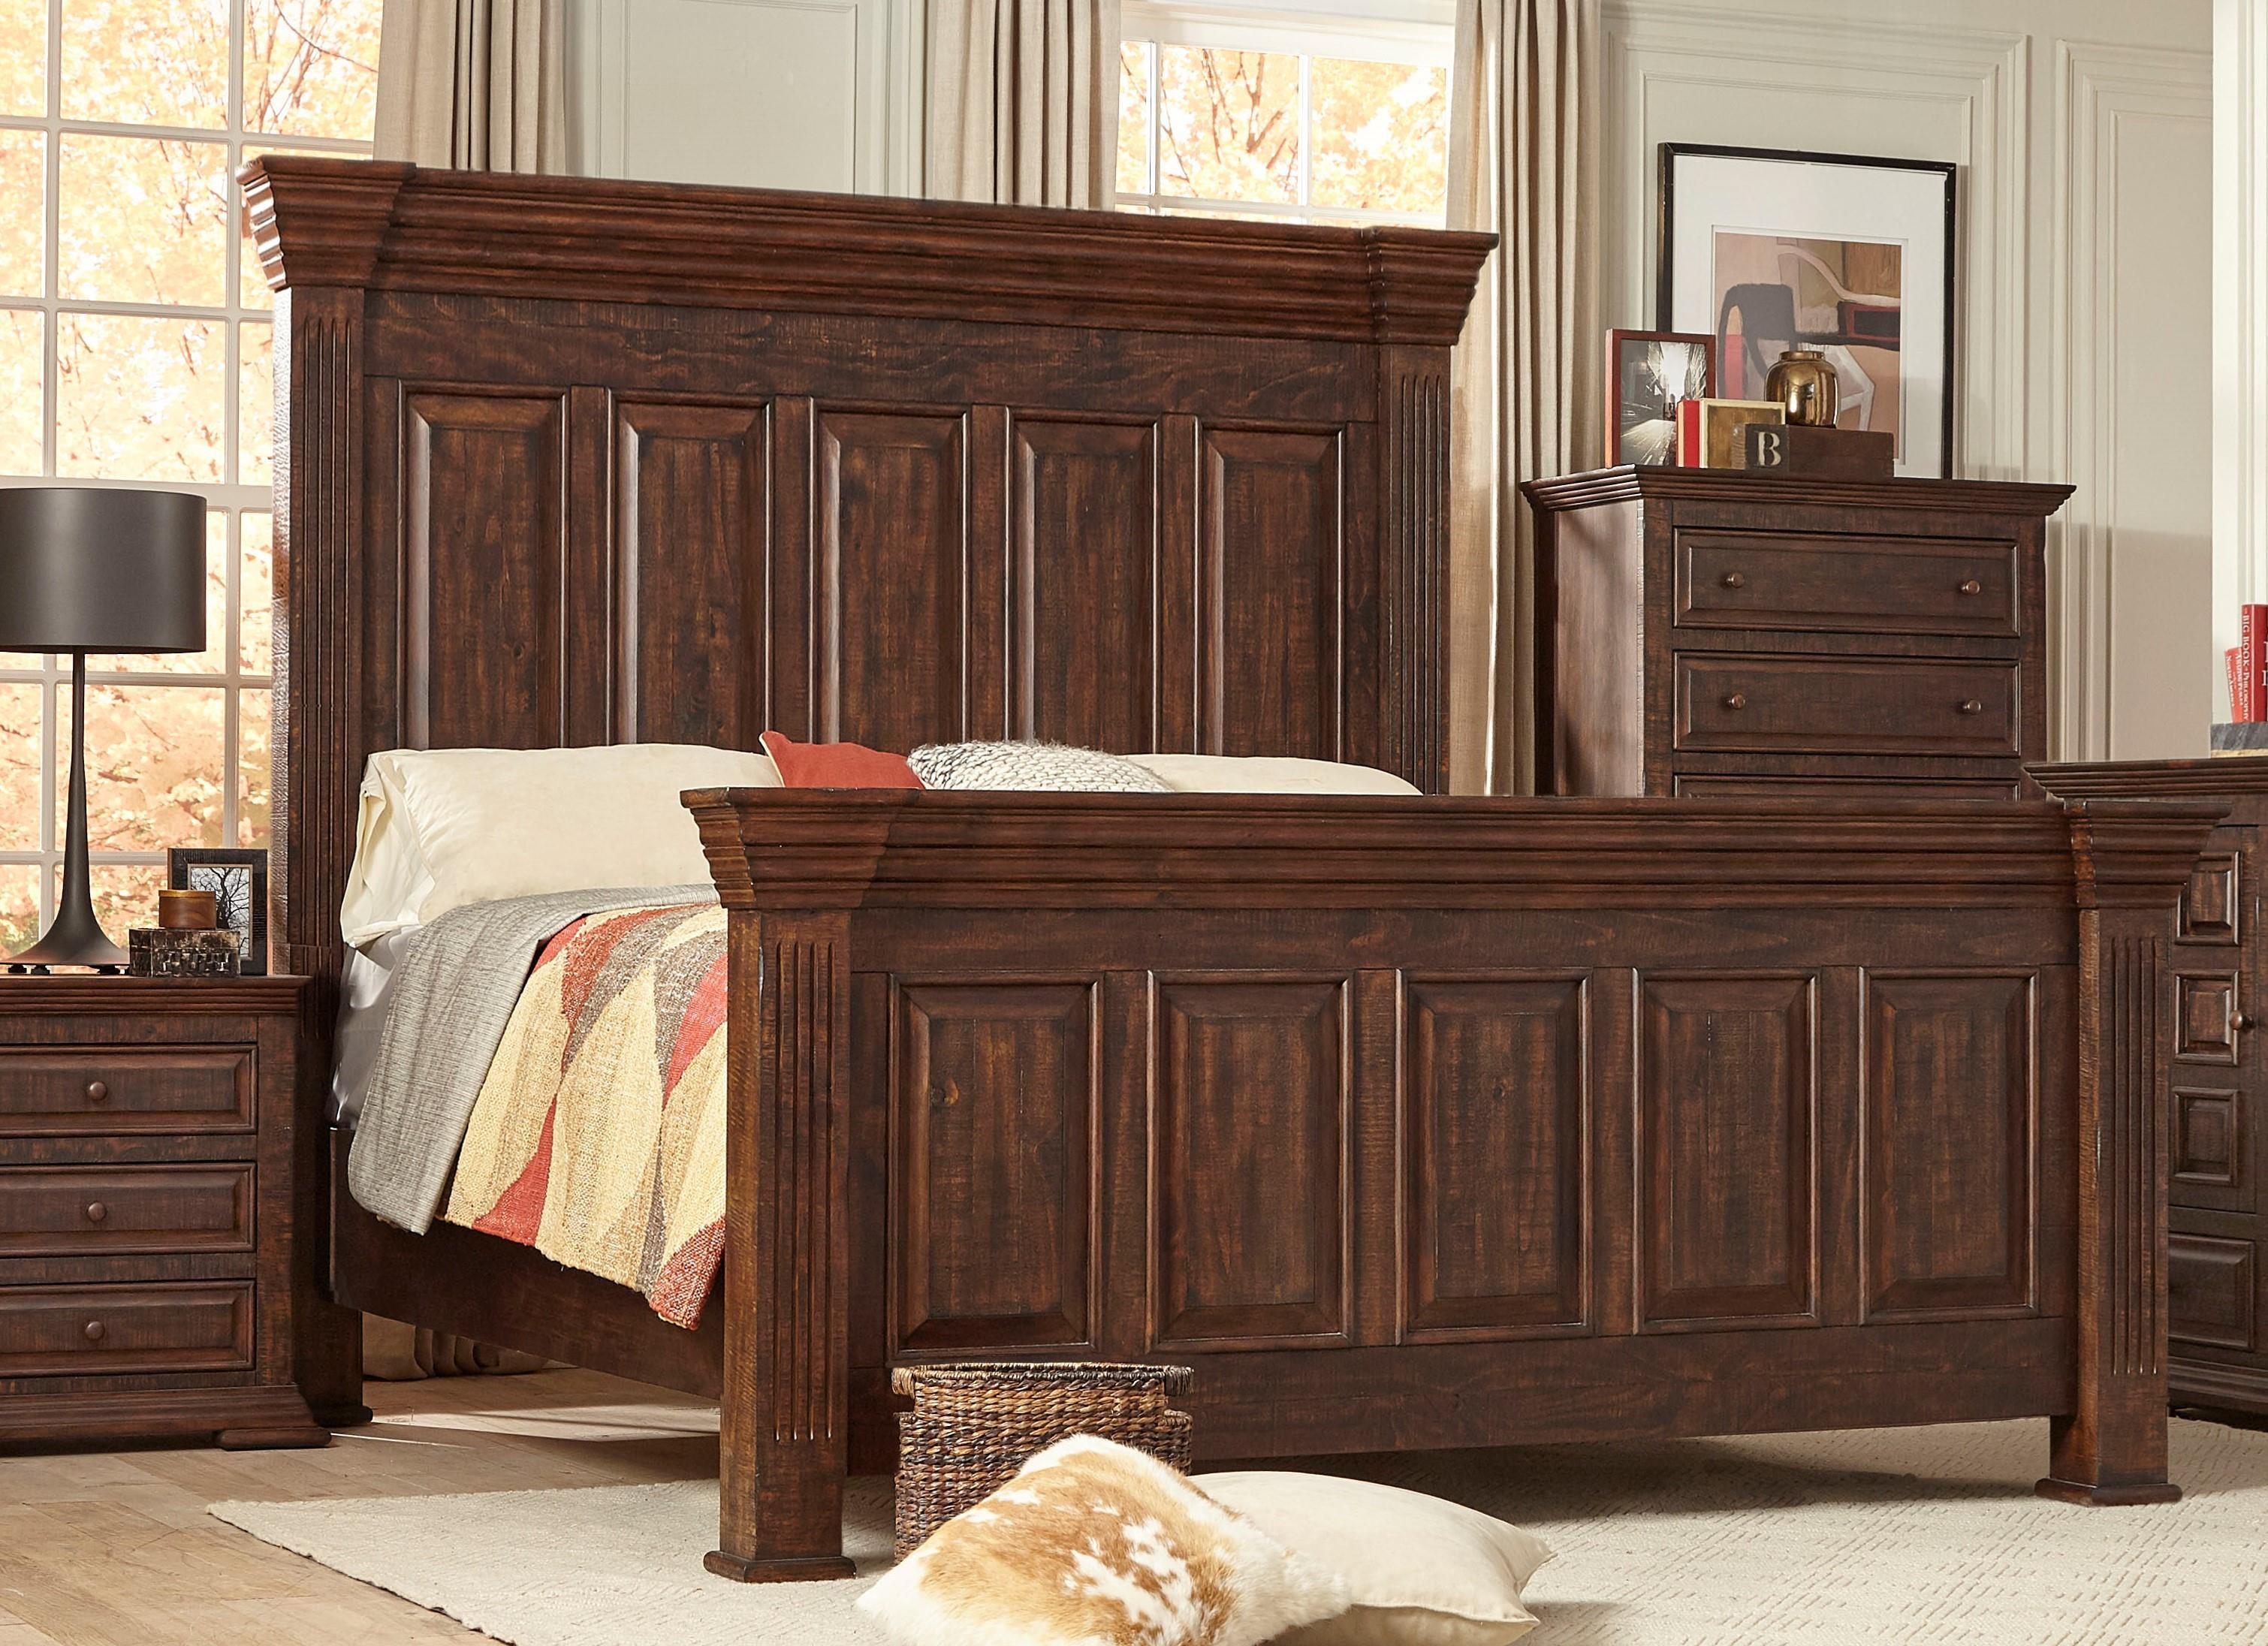 Lifestyle C7298 C7298k King Bed Furniture Fair North Carolina Panel Beds